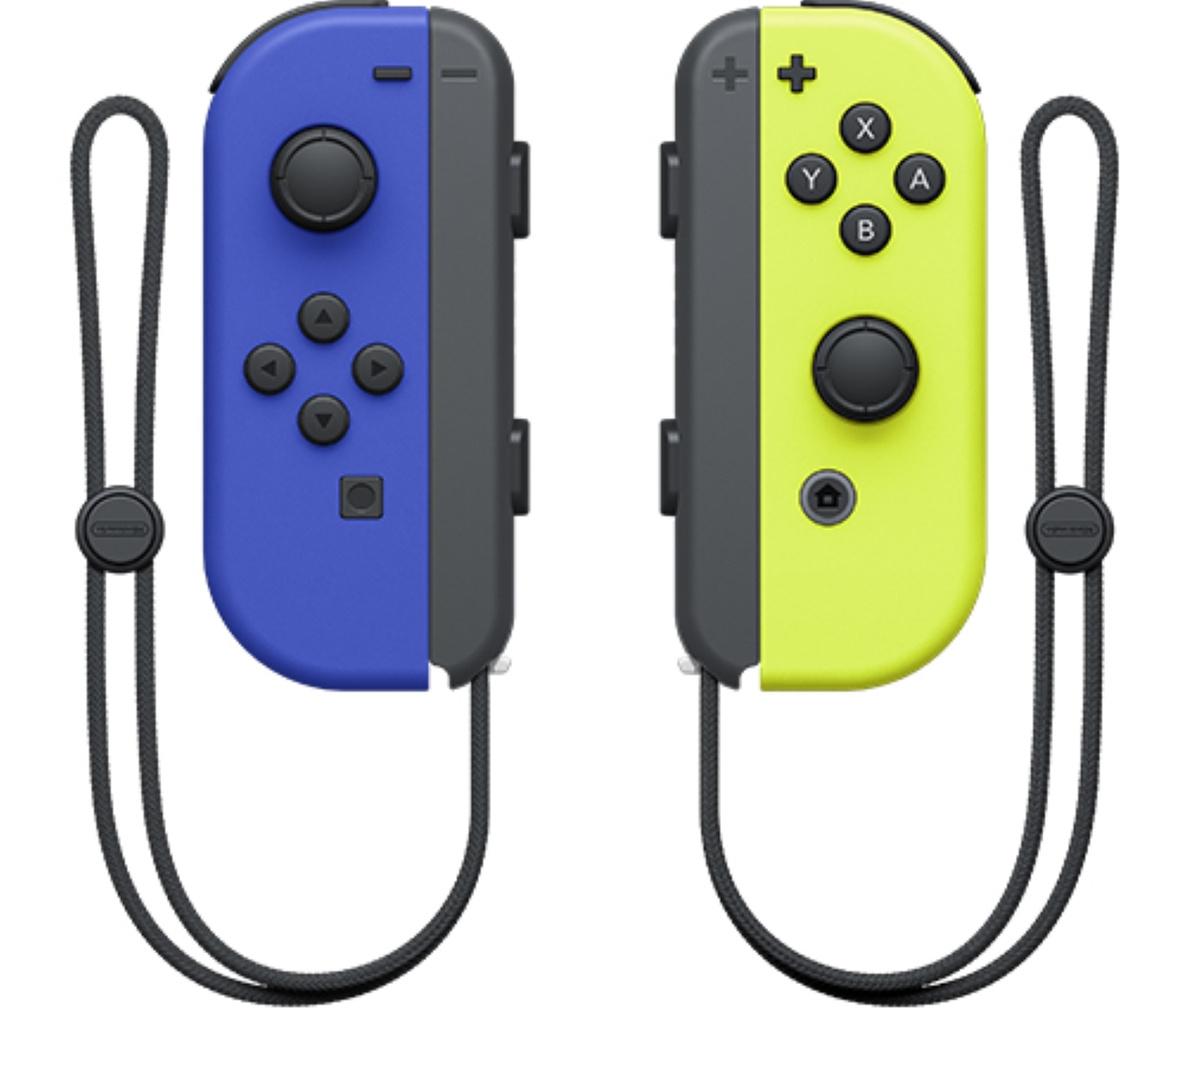 Контроллер Nintendo Joy-Con, синий, желтый #1